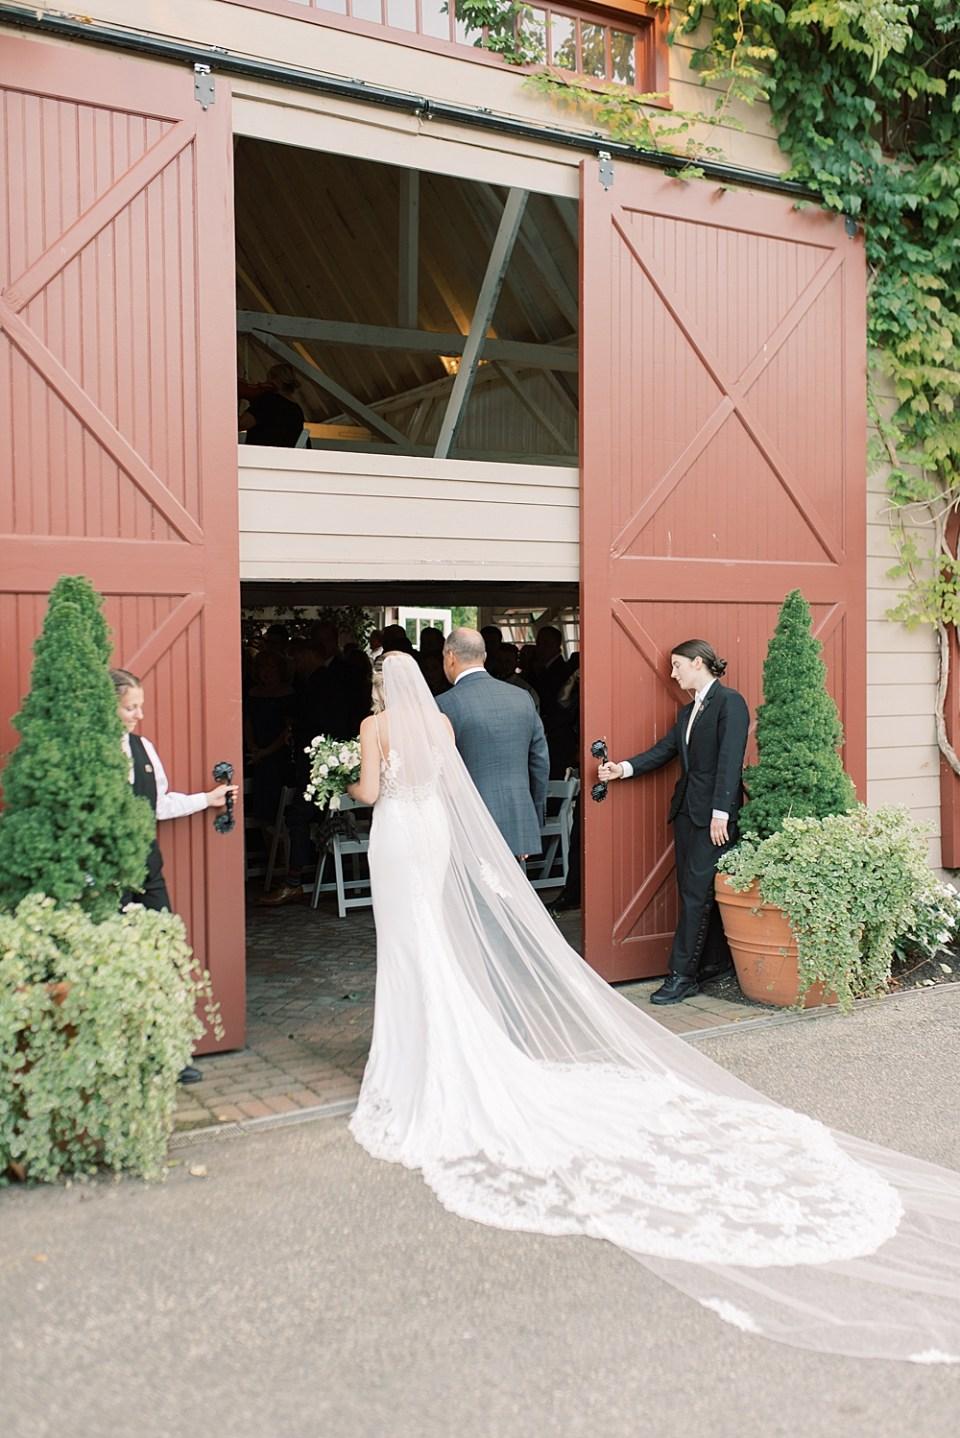 dad + daughter walking down the aisle | Ashford Estate wedding ceremony | new jersey wedding photographer sarah canning